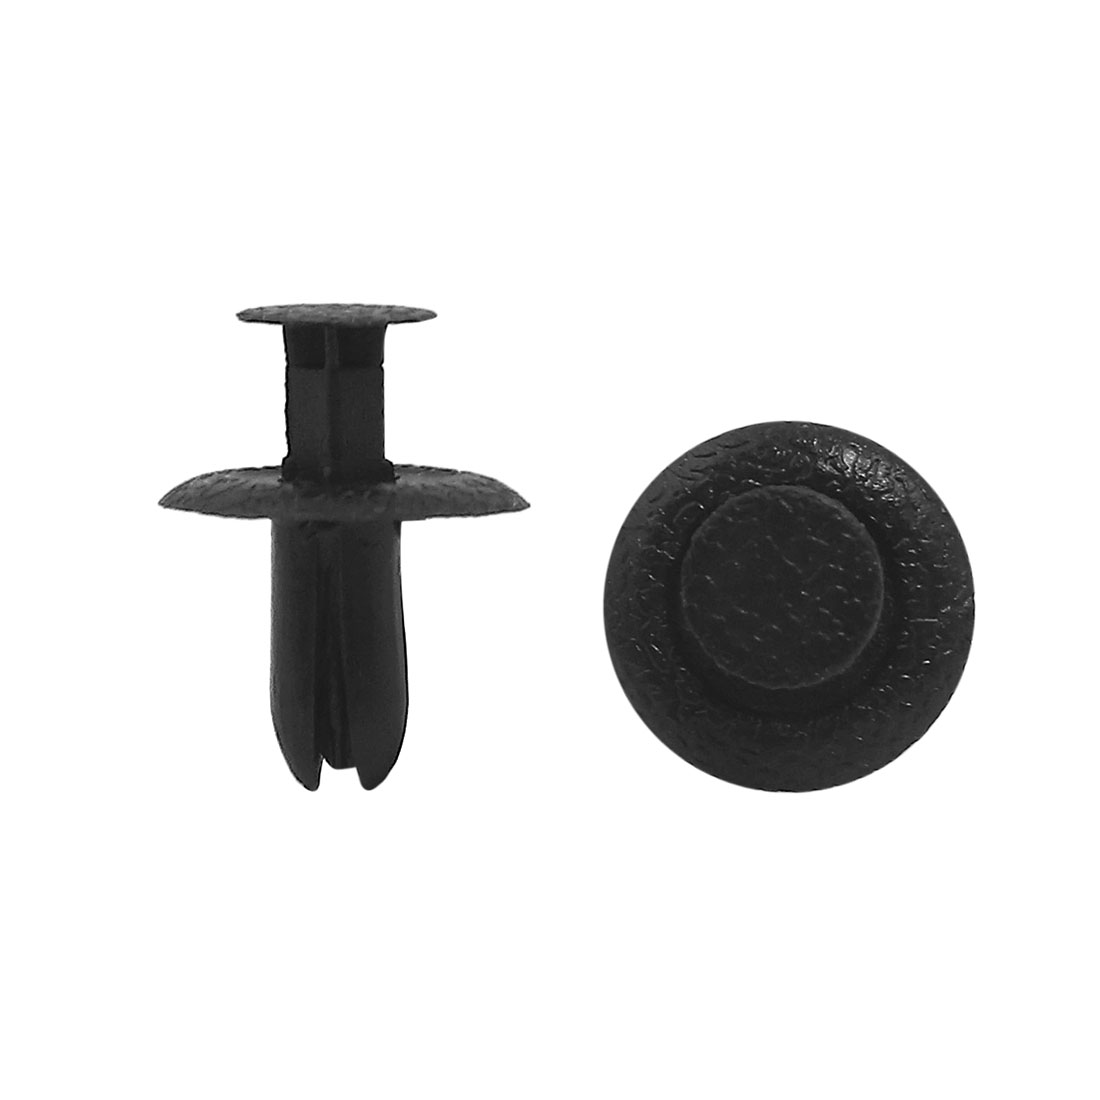 Car Plastic Rivet Bumper Fender Fastener Retainer Clip Black 6mm Hole 20pcs